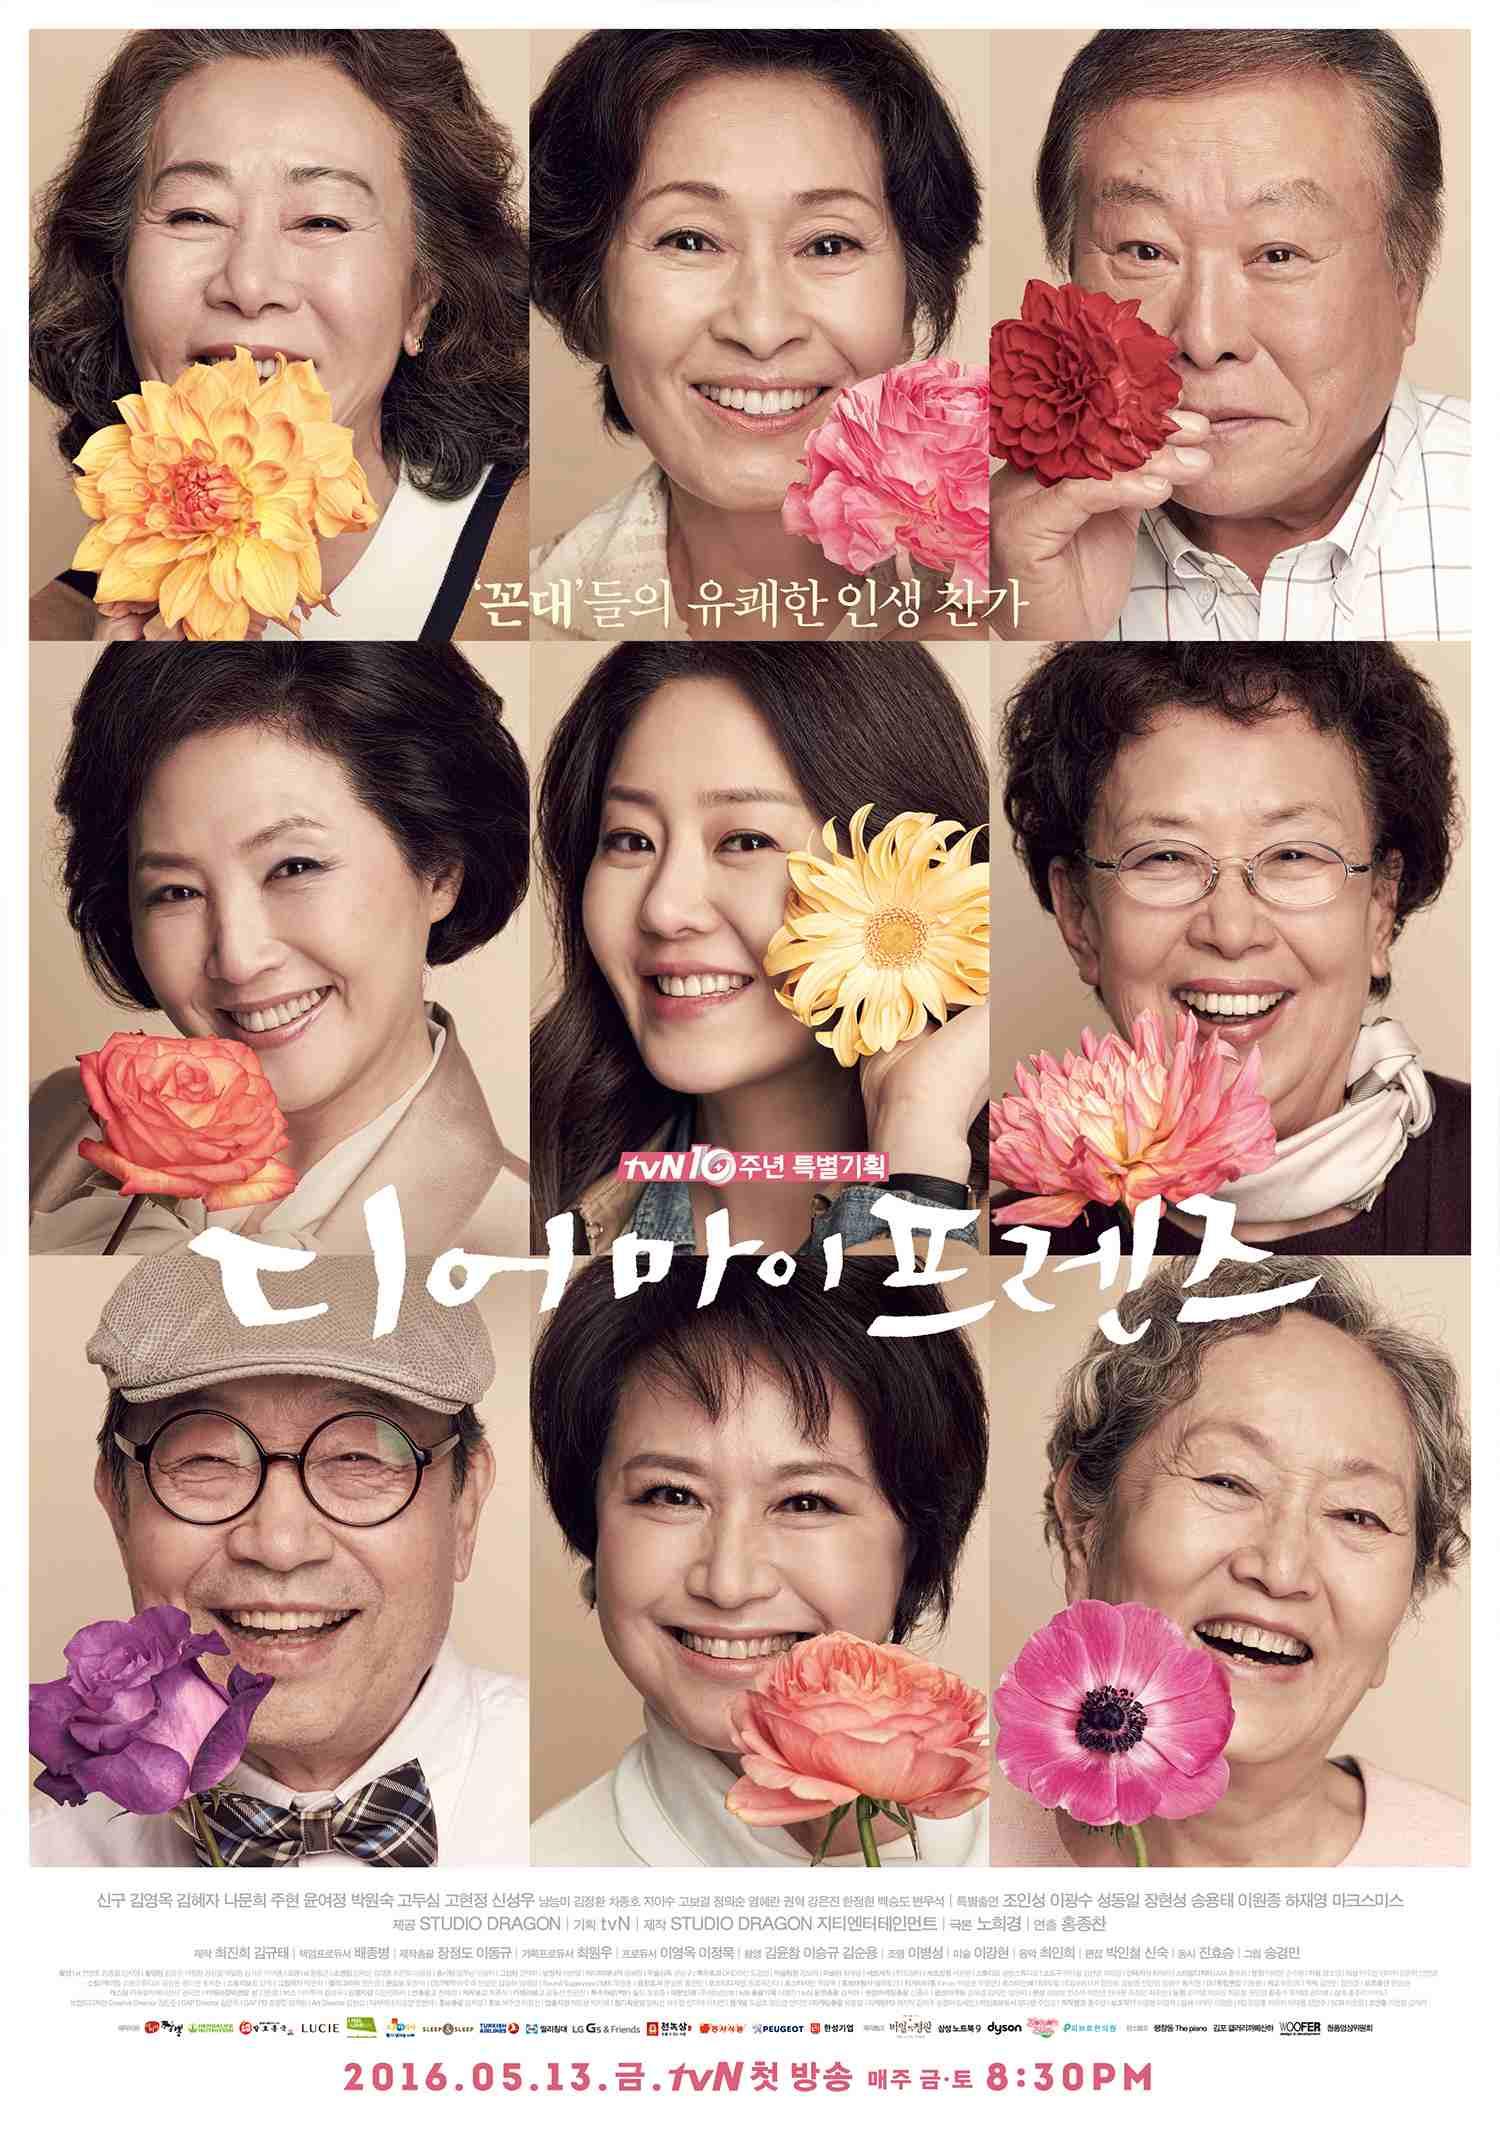 ➔TOP1 tvN《Dear My Friends》 主演:高賢廷、高斗心、金惠子、 羅文姬、朴元淑、尹汝貞、 申 久、金英玉、朱 鉉、 申成宇